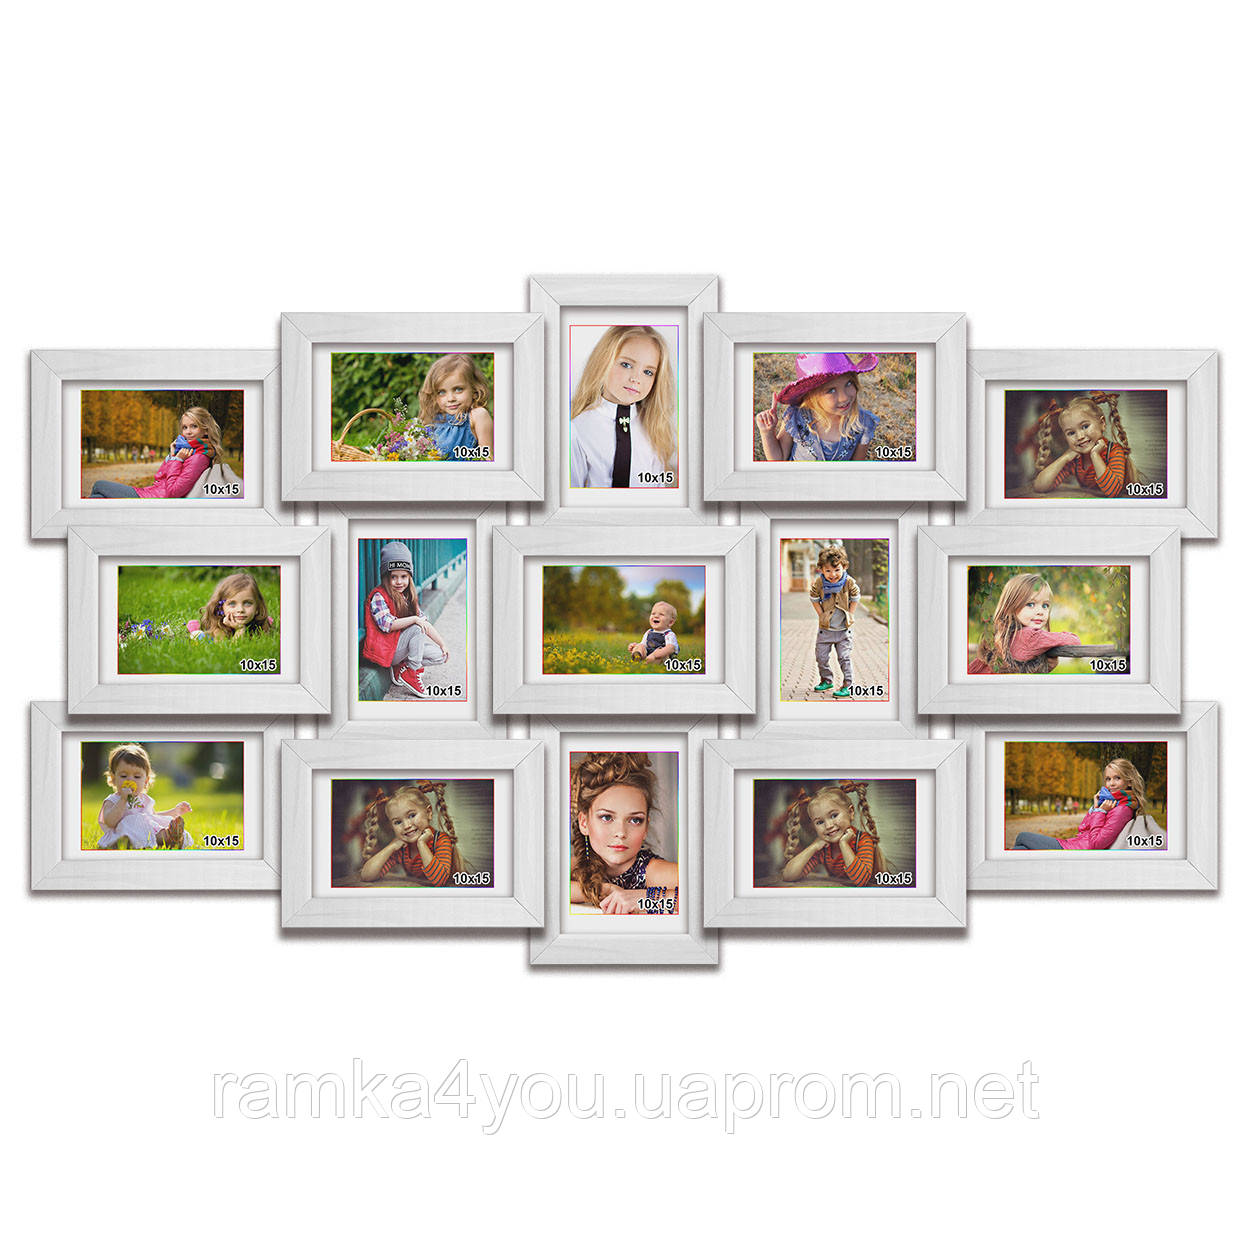 Мультирамка-коллаж Елизавета на 15 фотографий 10х15 белая премиум